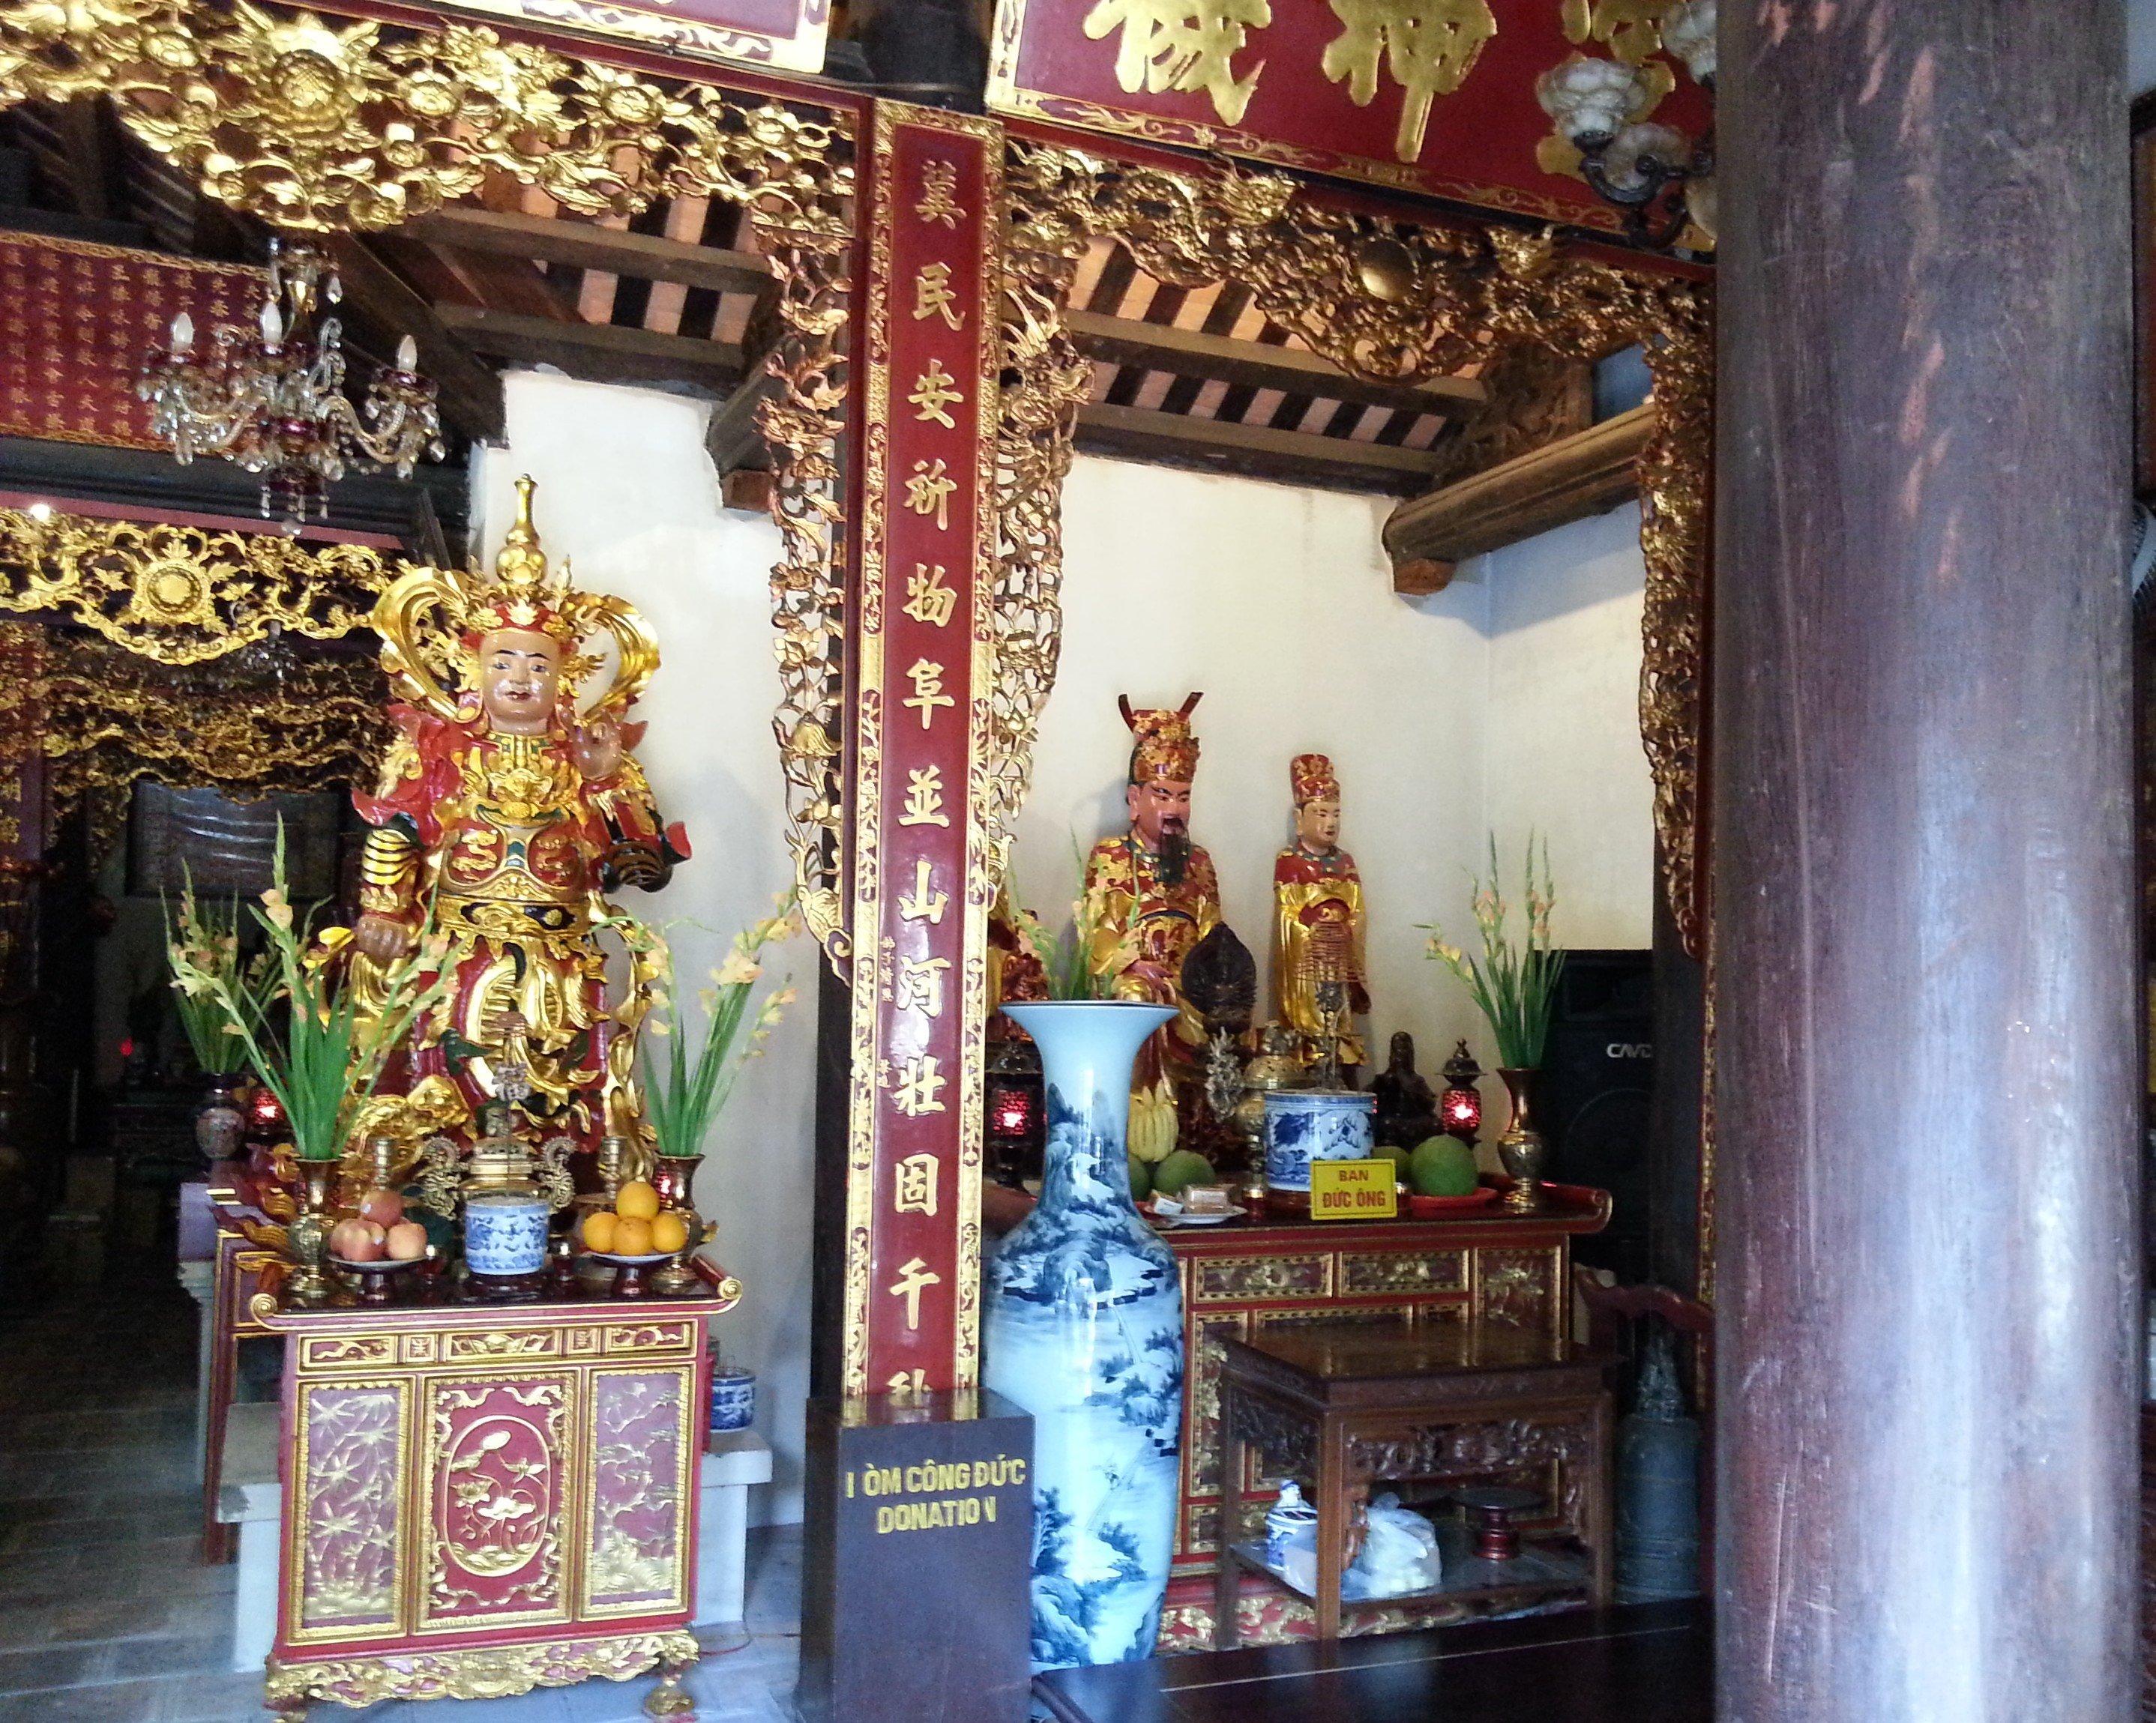 Guan Yu and Confucius shrines at Chua Dien Huu Pagoda